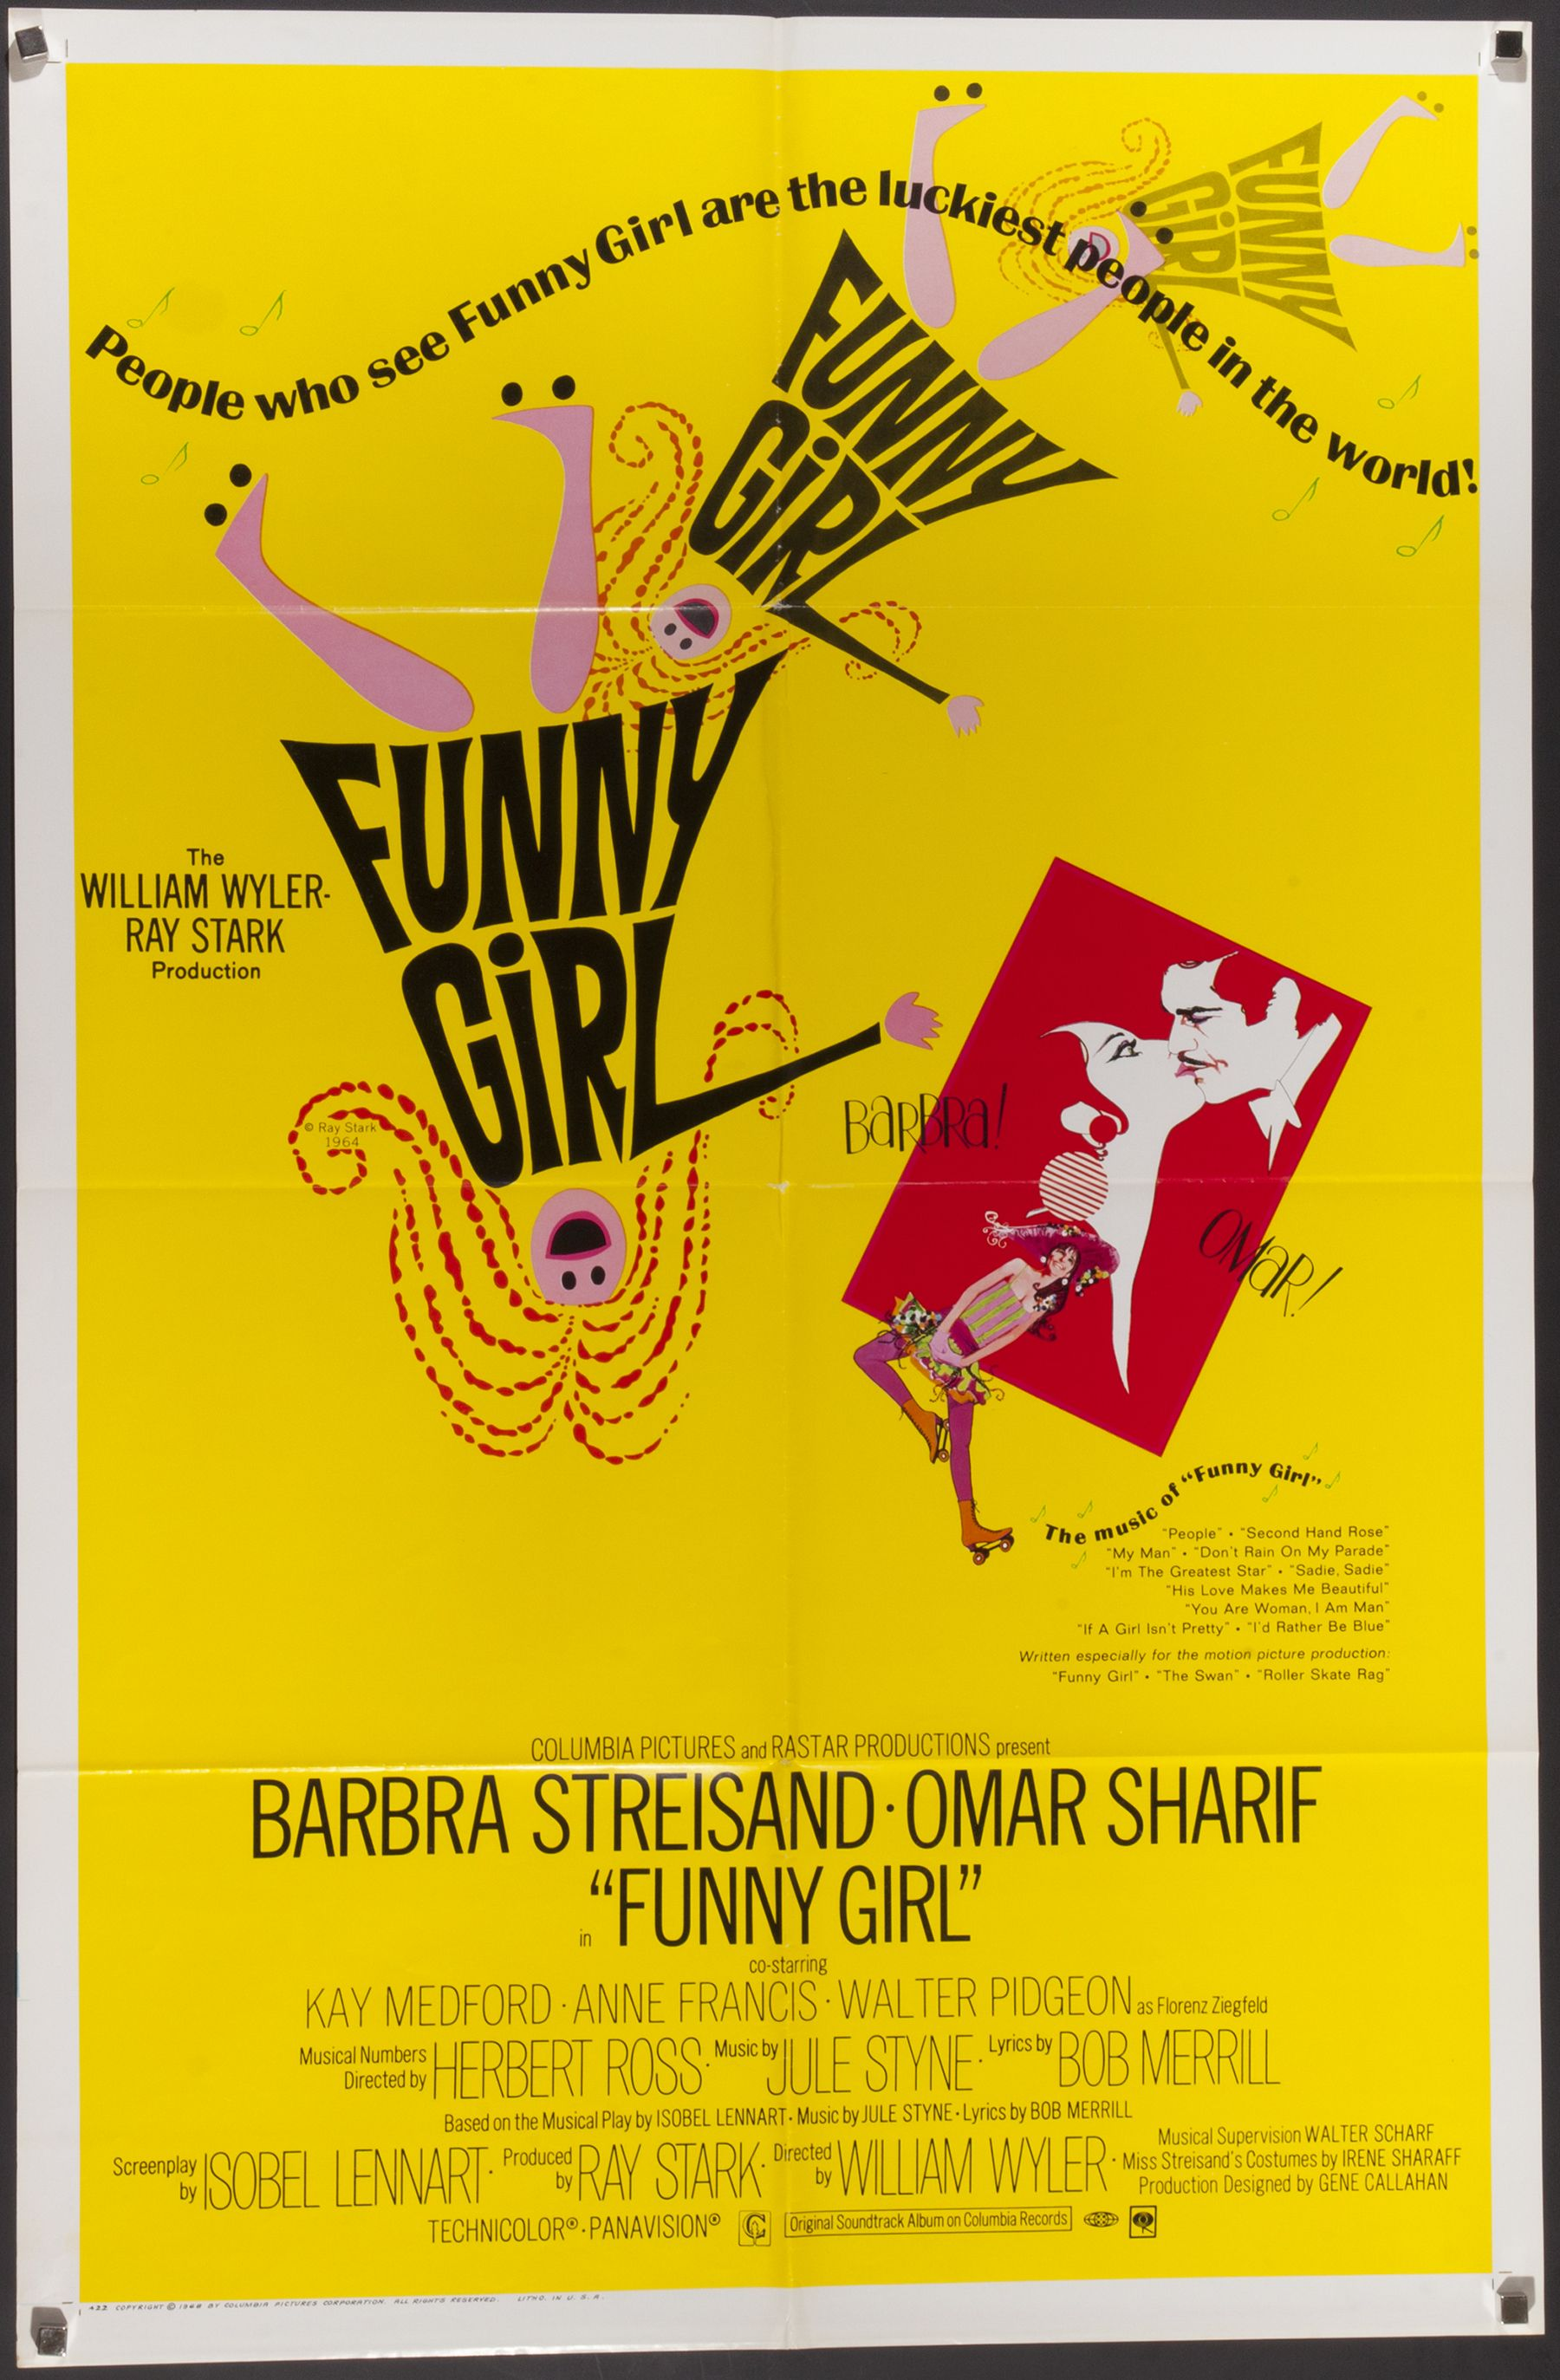 Original Funny Girl 1968 Film Poster Chairish